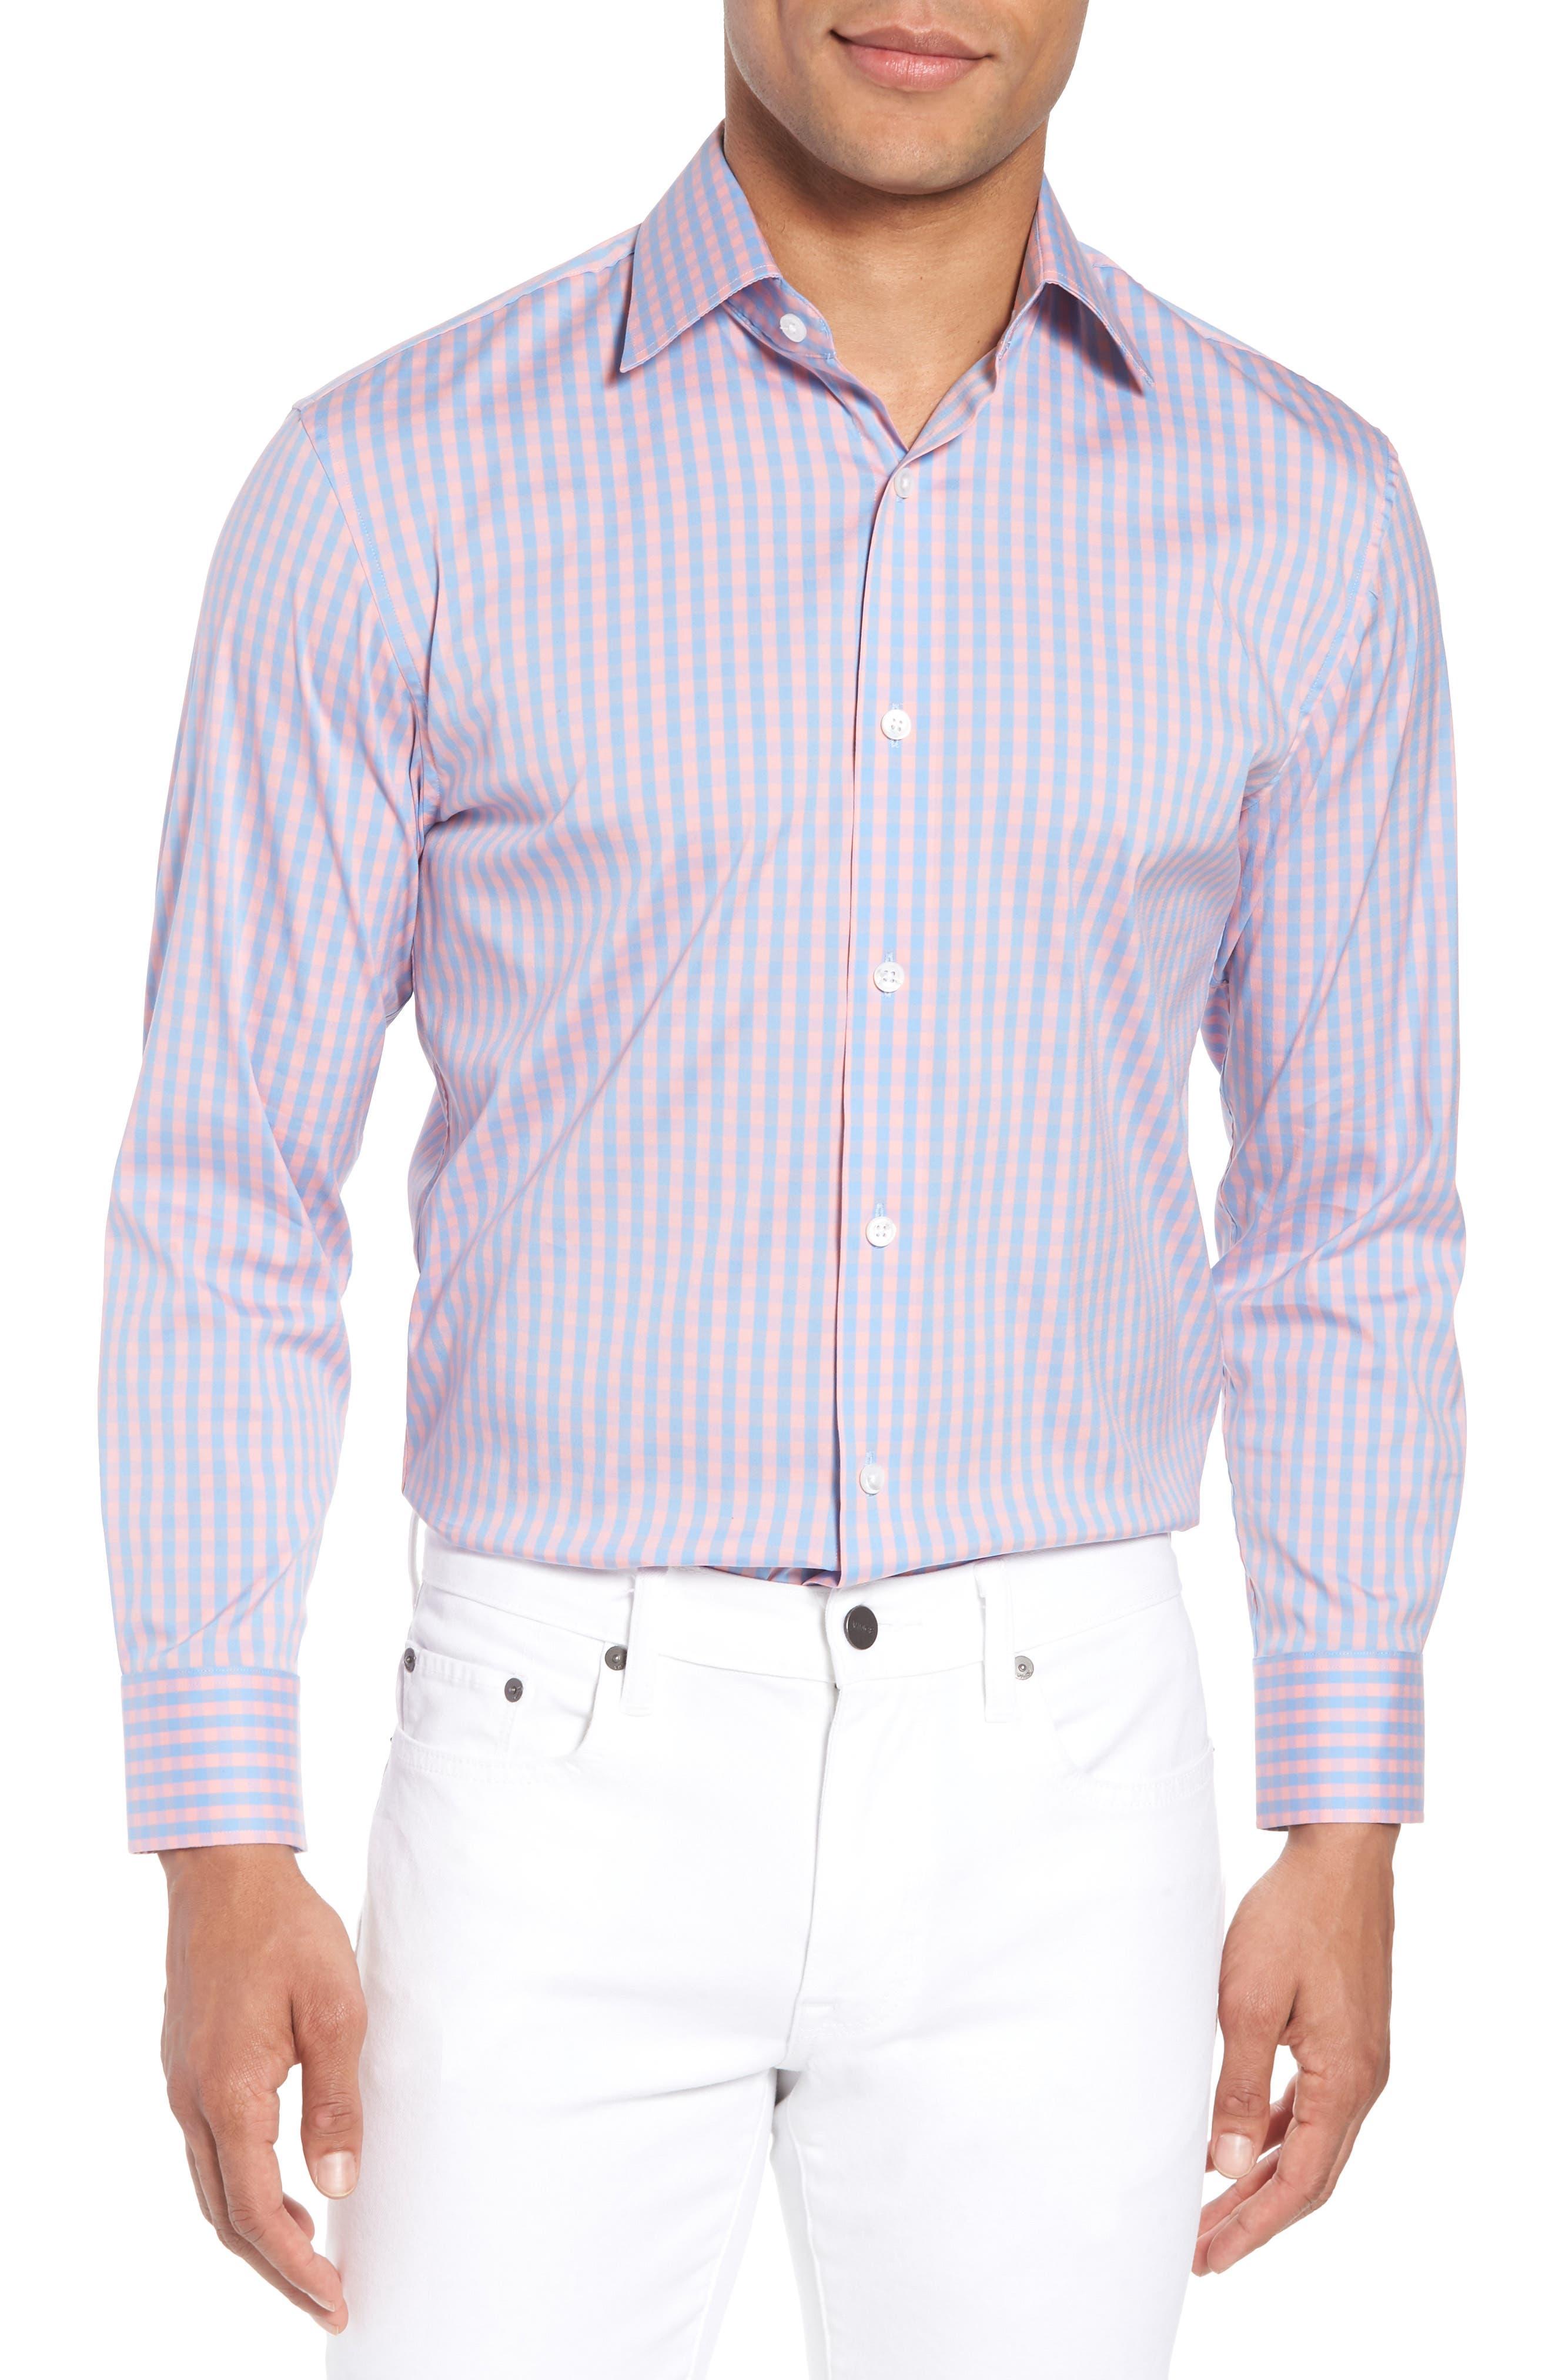 Jetsetter Slim Fit Stretch Check Dress Shirt,                             Main thumbnail 1, color,